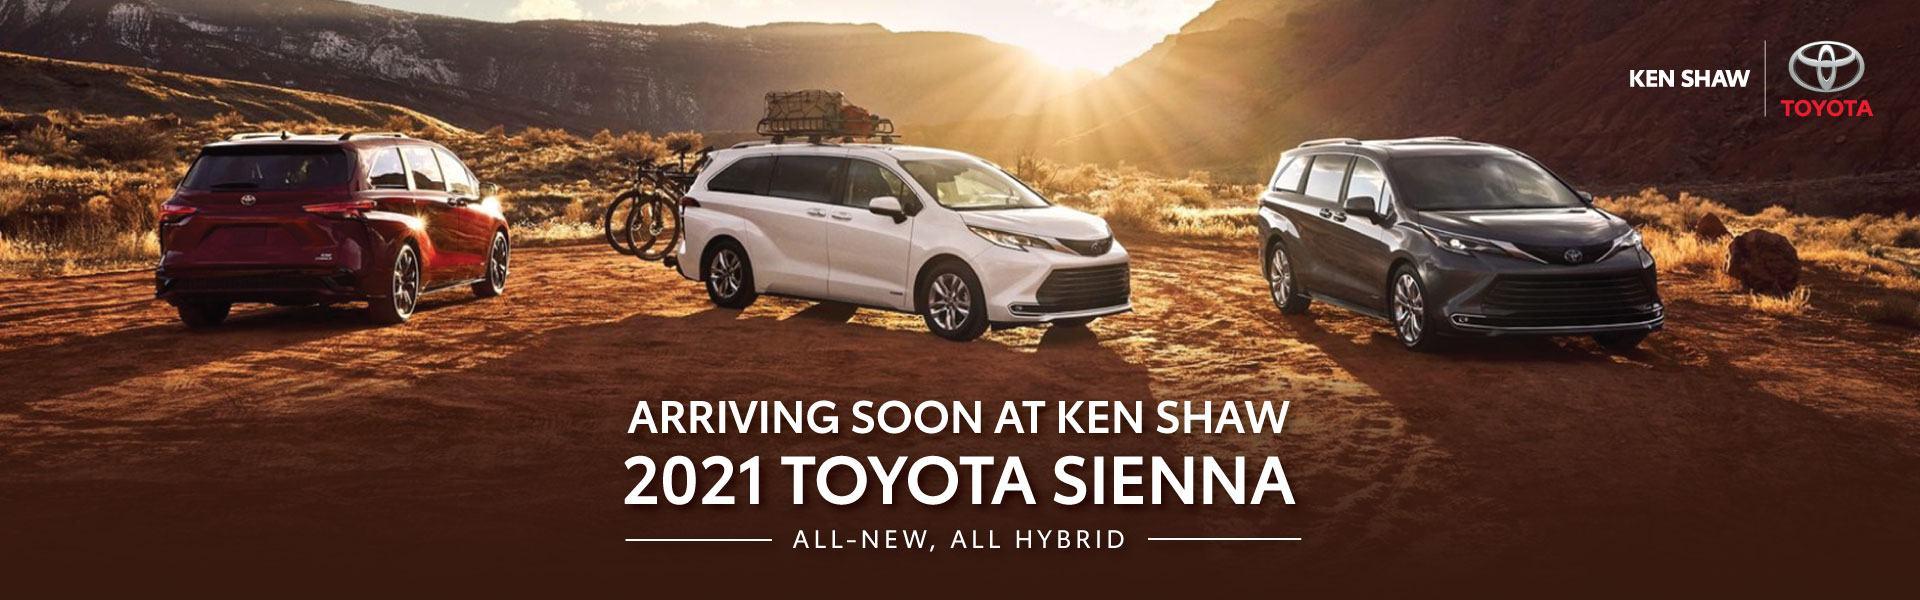 2021 Toyota Sienna Hybrid ken shaw toyota in toronto Ontario